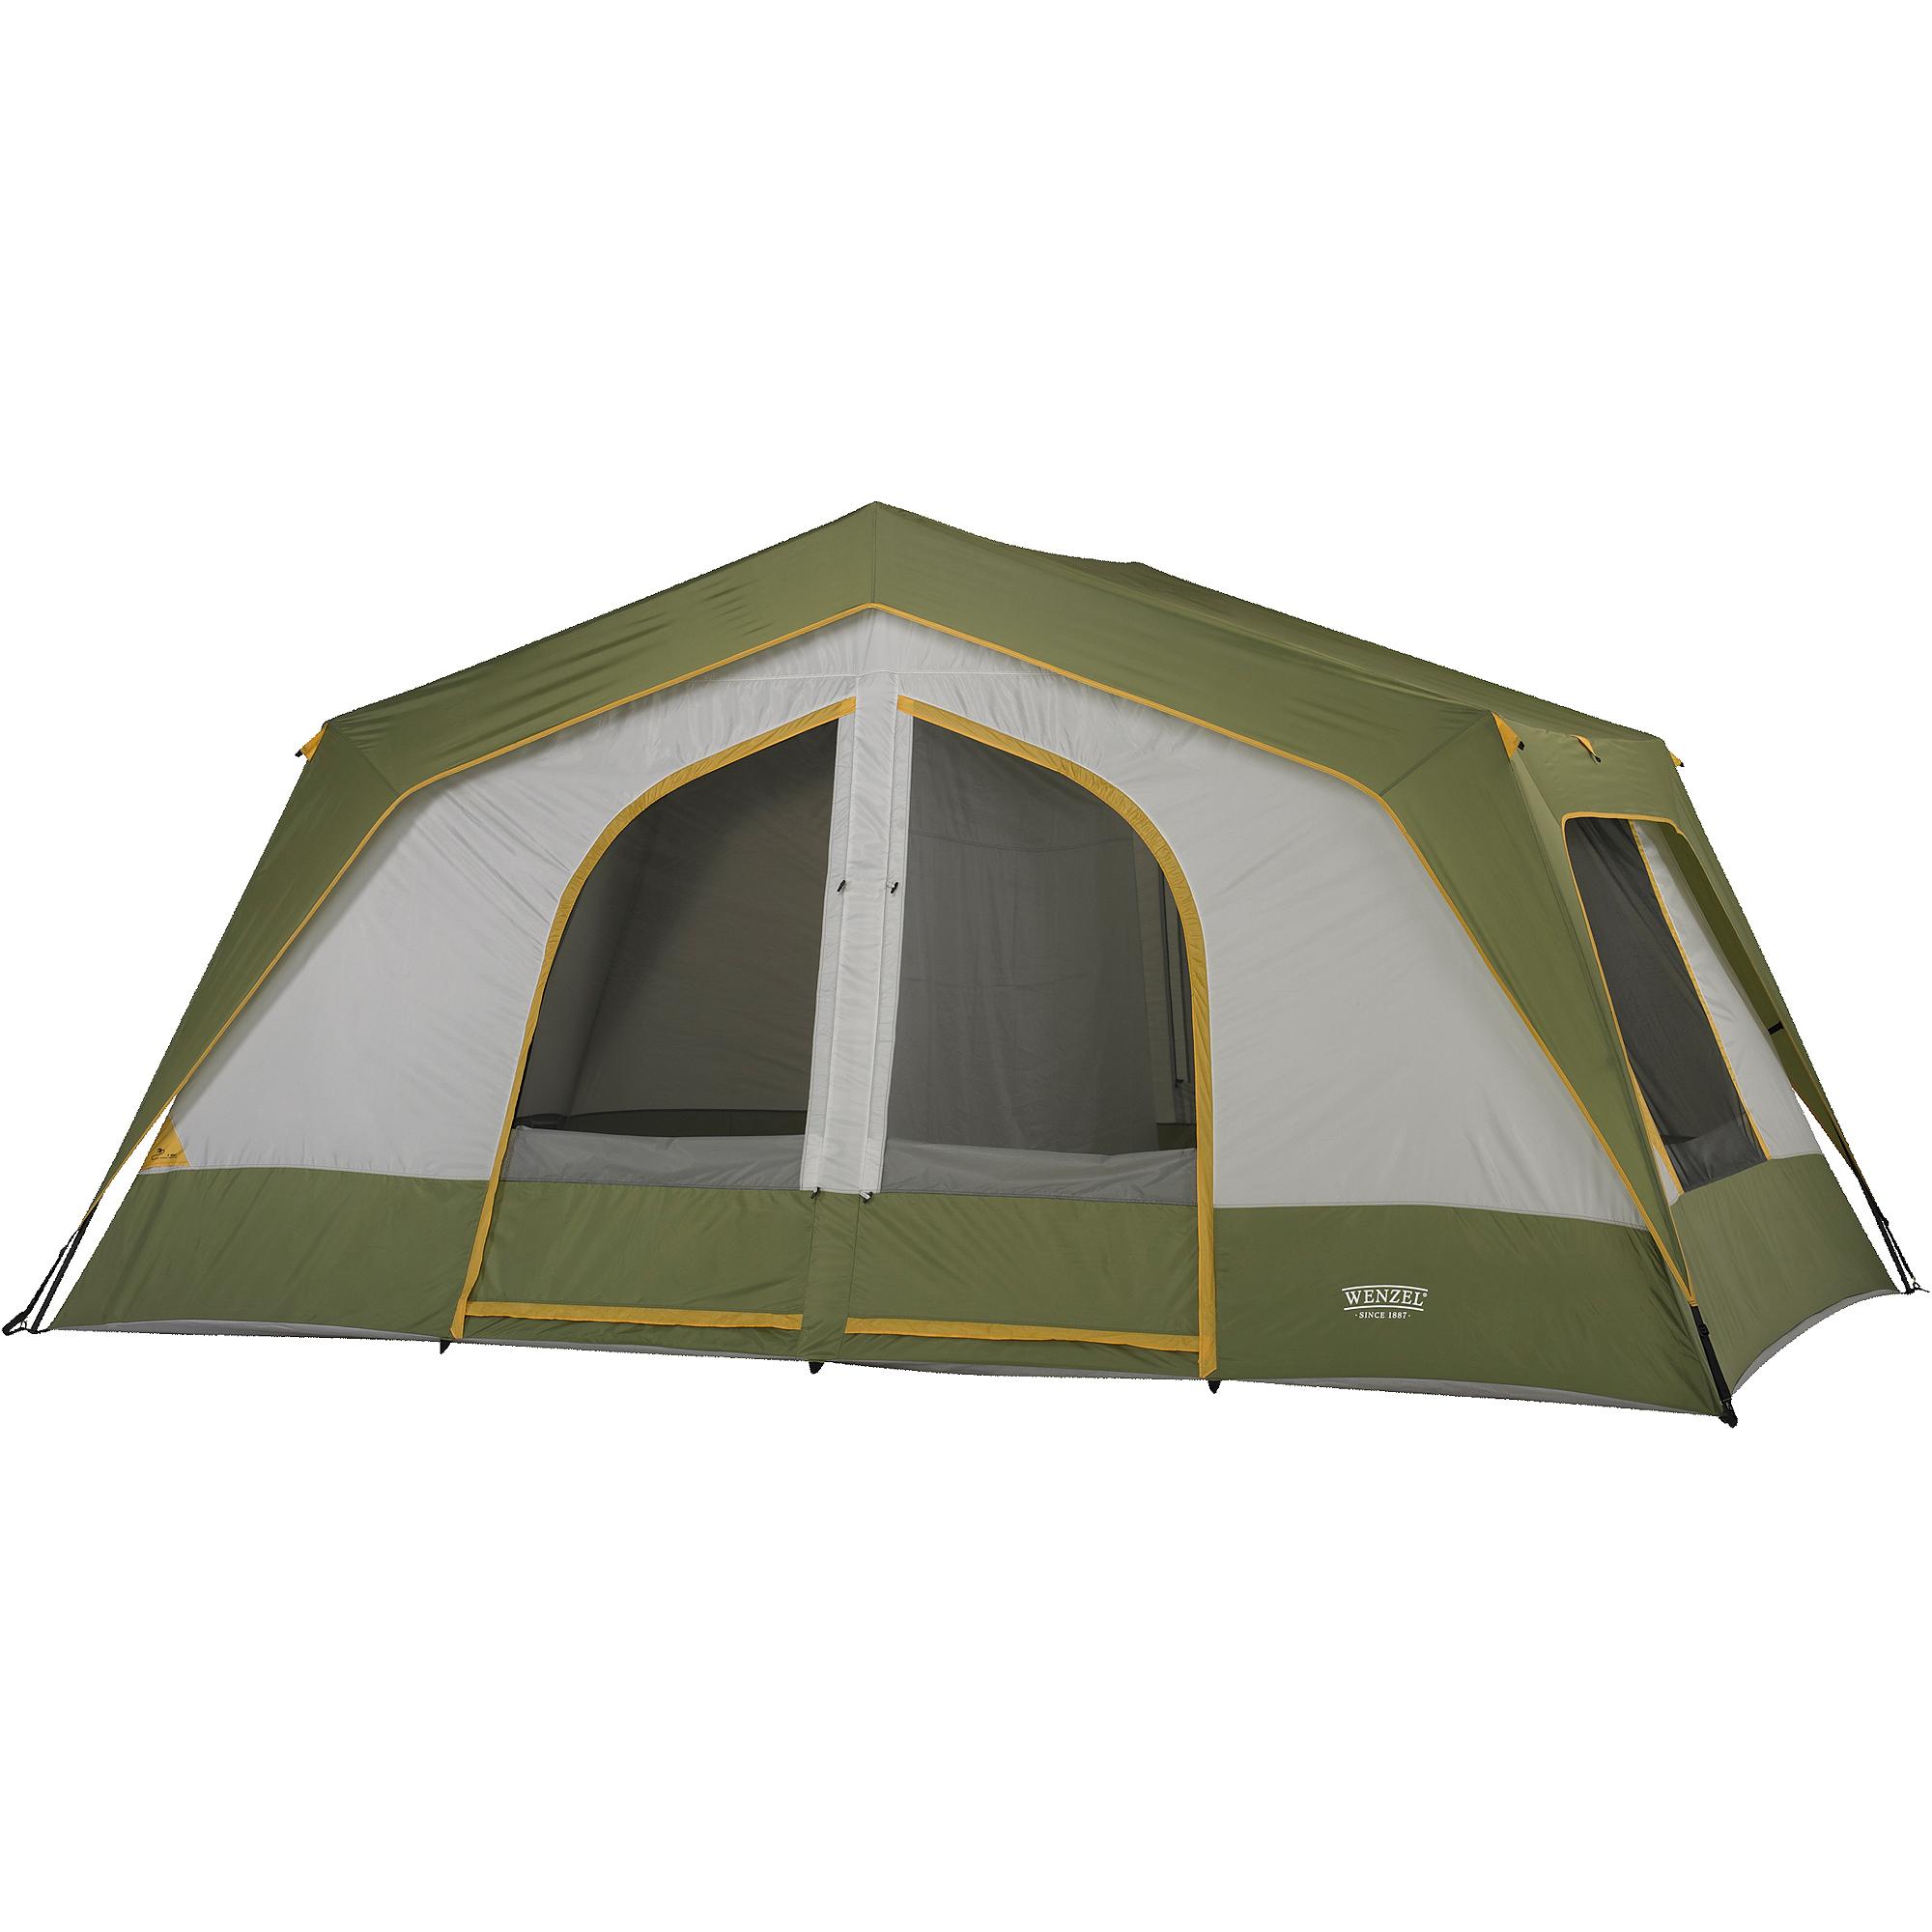 Wenzel Vacation Lodge Large 16' x 10' Tent, Sleeps 10